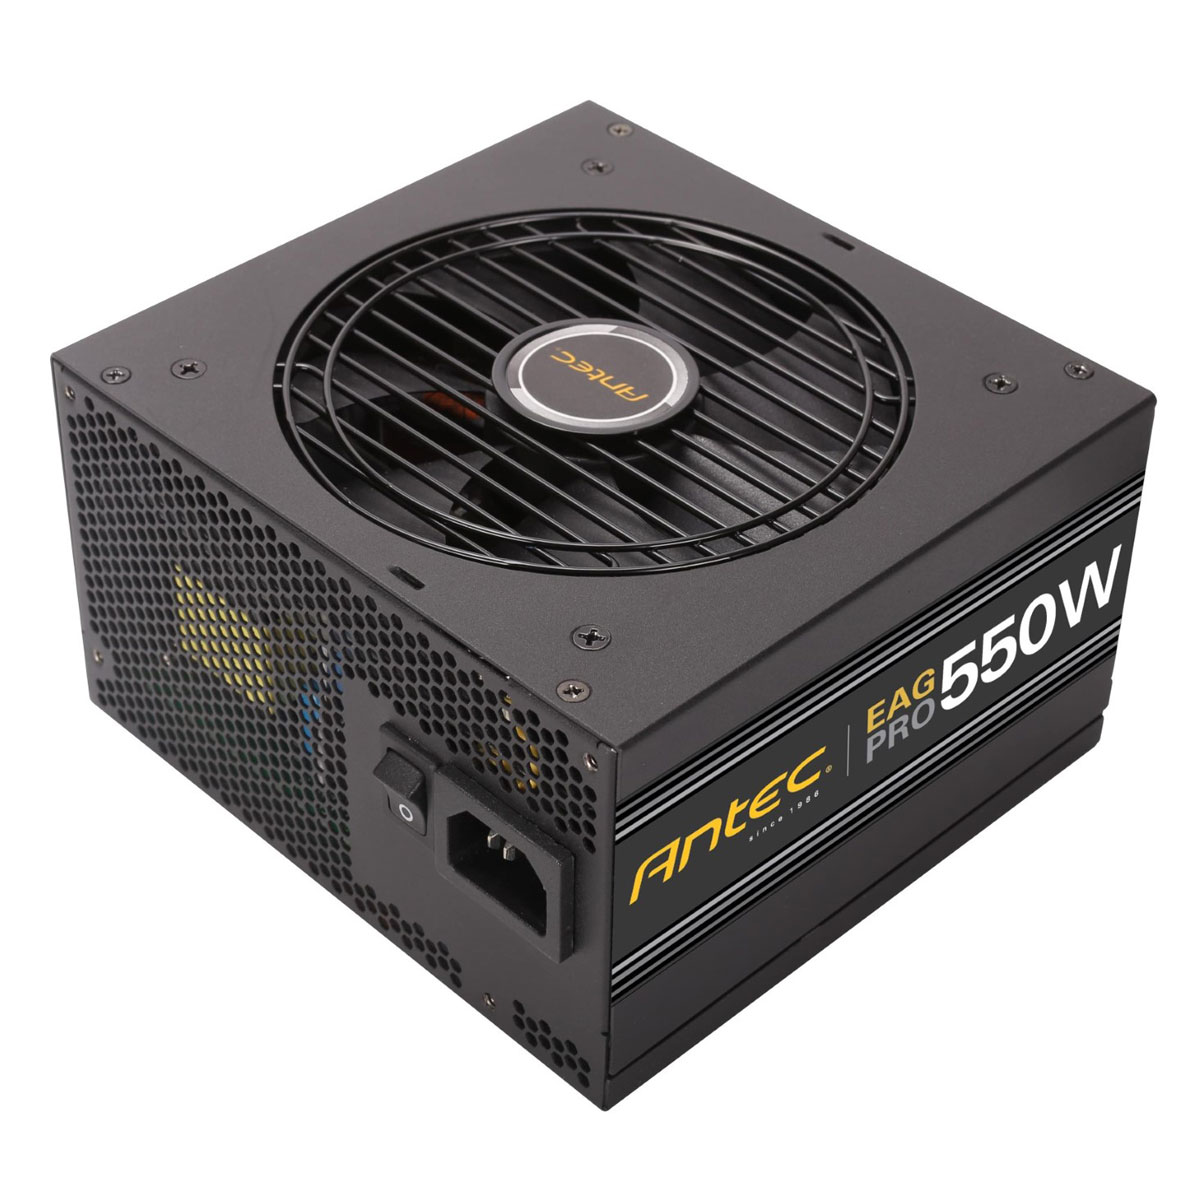 Alimentation PC Antec EA550G PRO Alimentation modulaire 550 Watts ATX12V 2.3 80 PLUS Gold